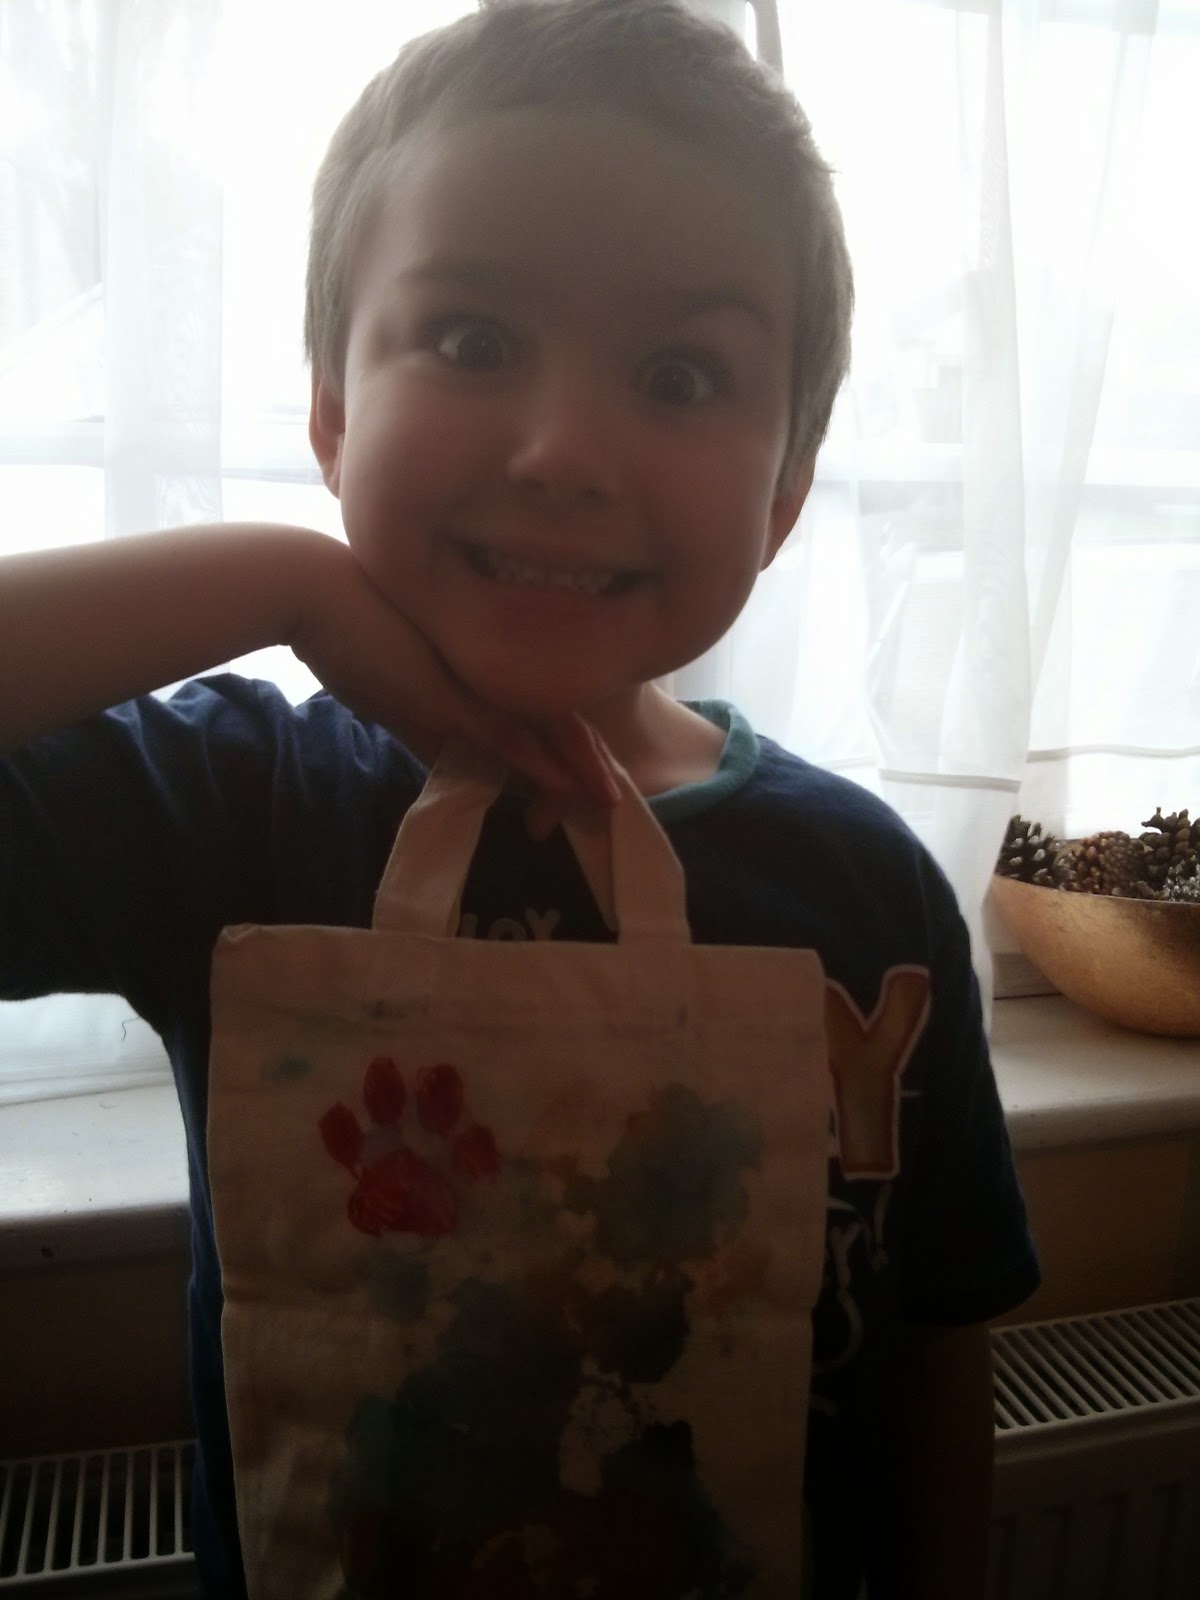 Big Boy and his Toucan Box Bag